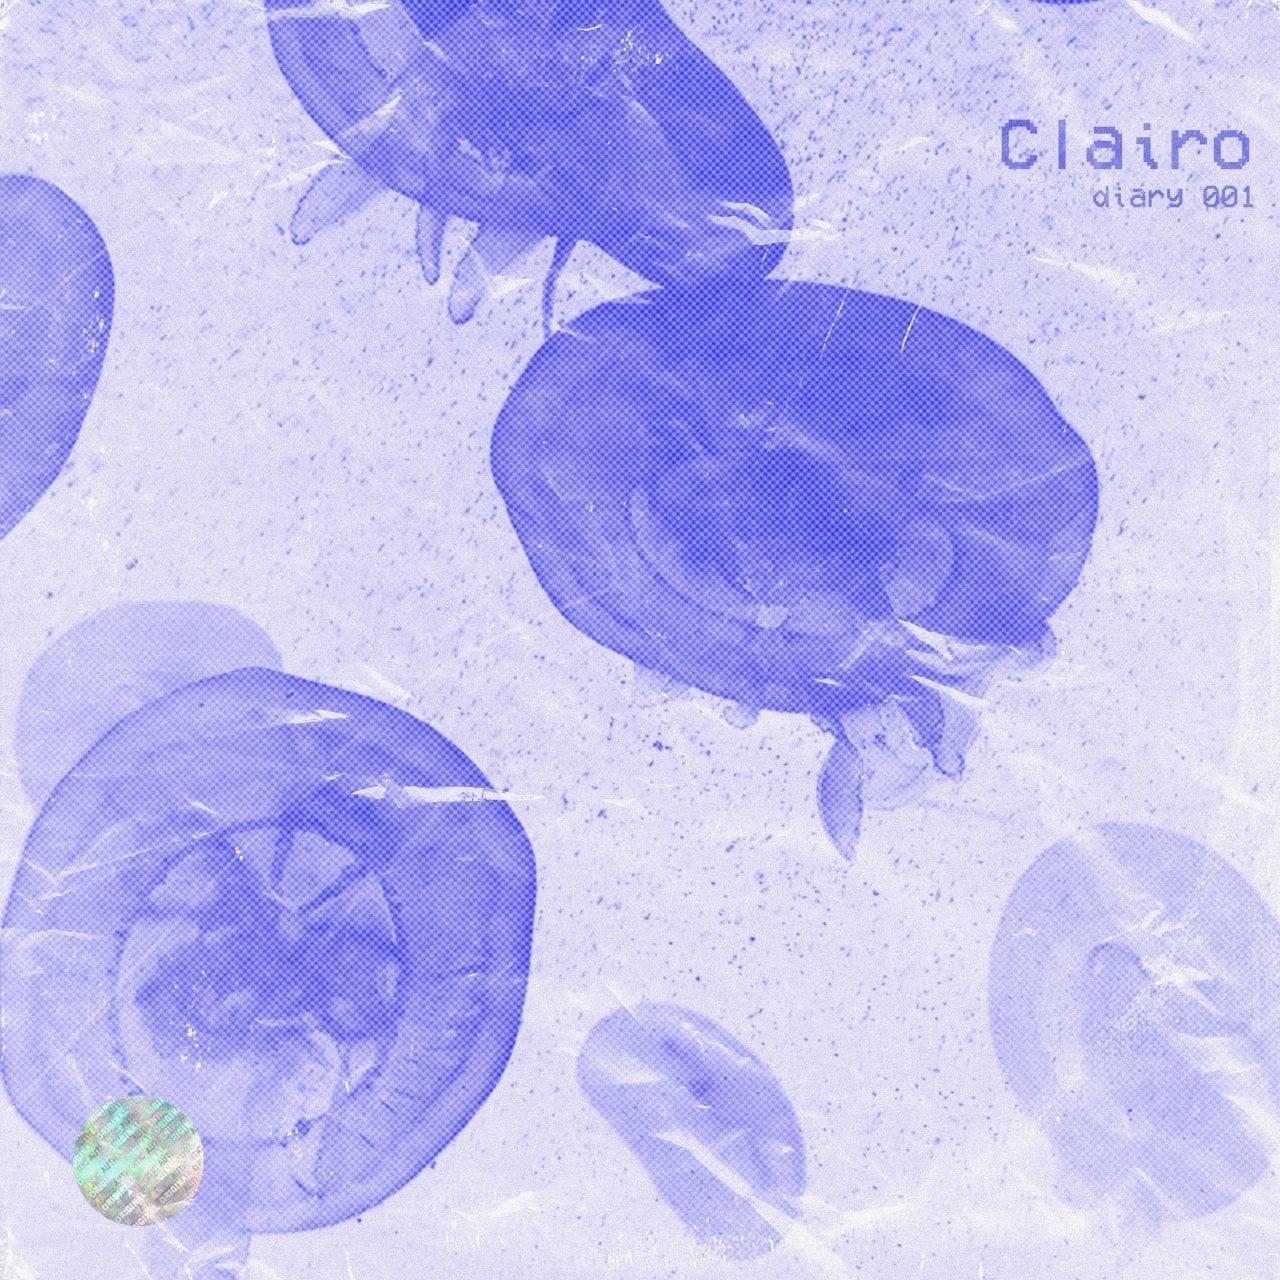 clairo